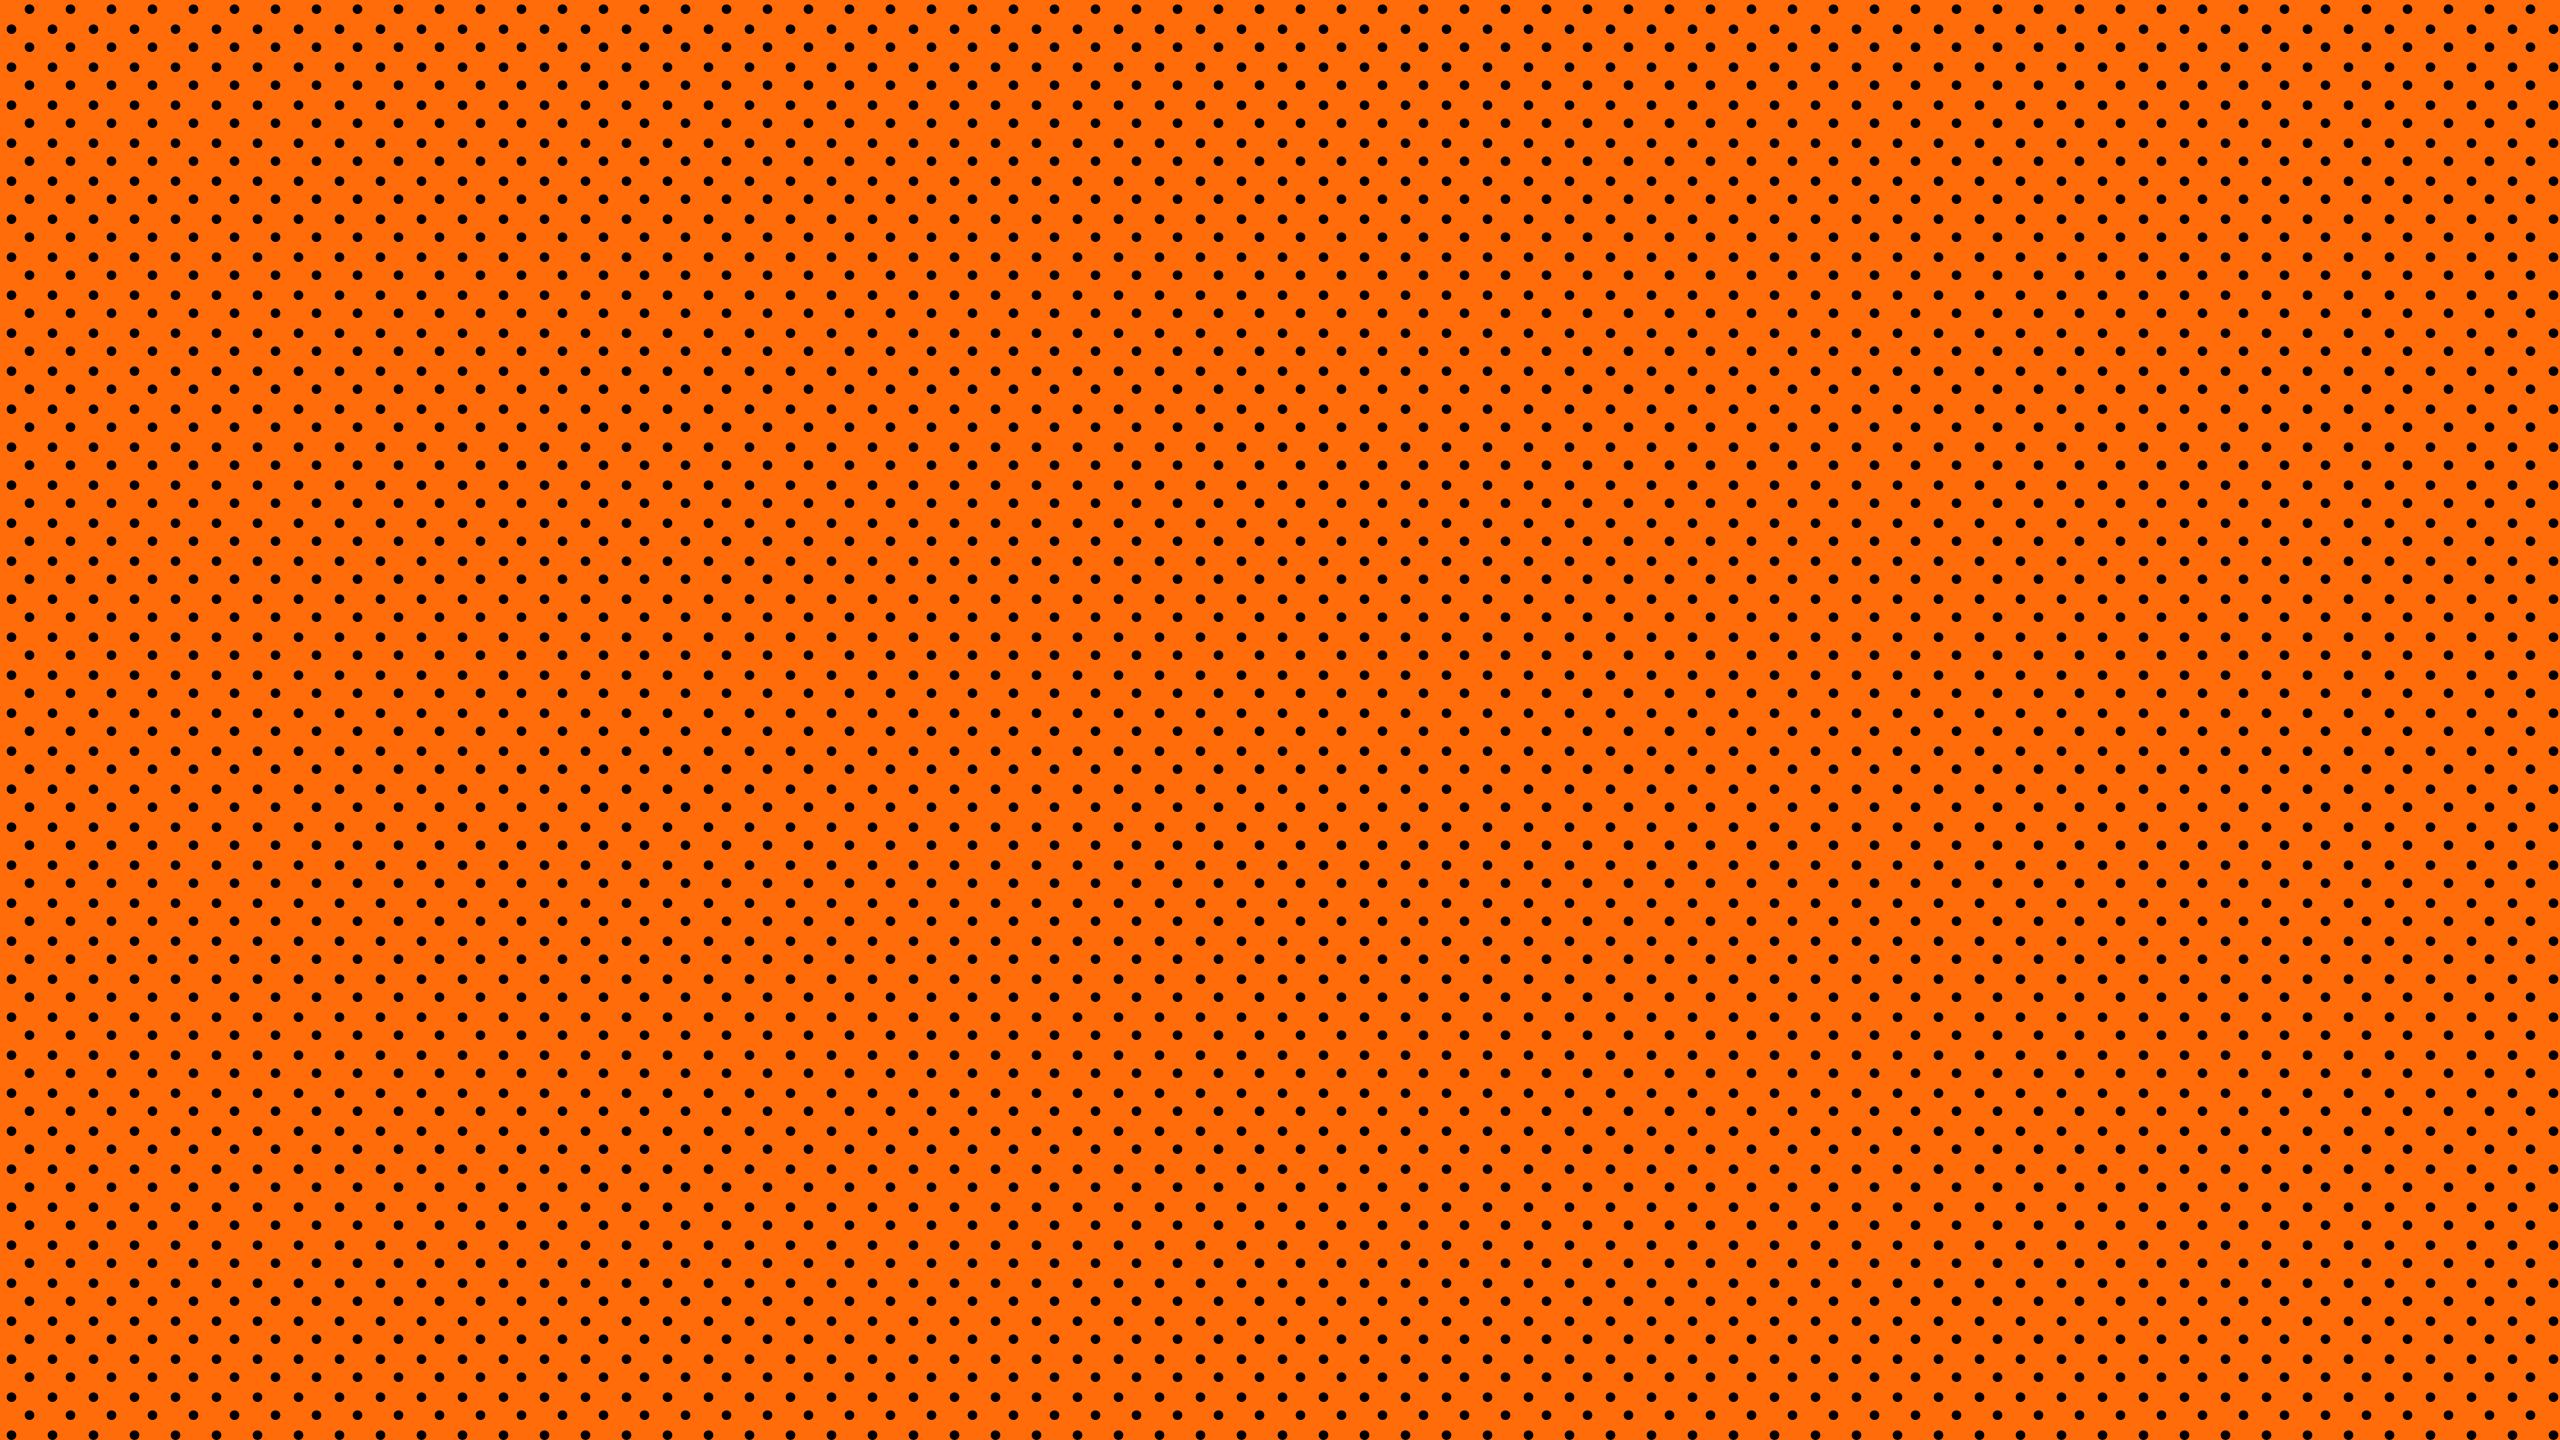 Black And Orange Wallpaper 06   [2560x1440] 2560x1440